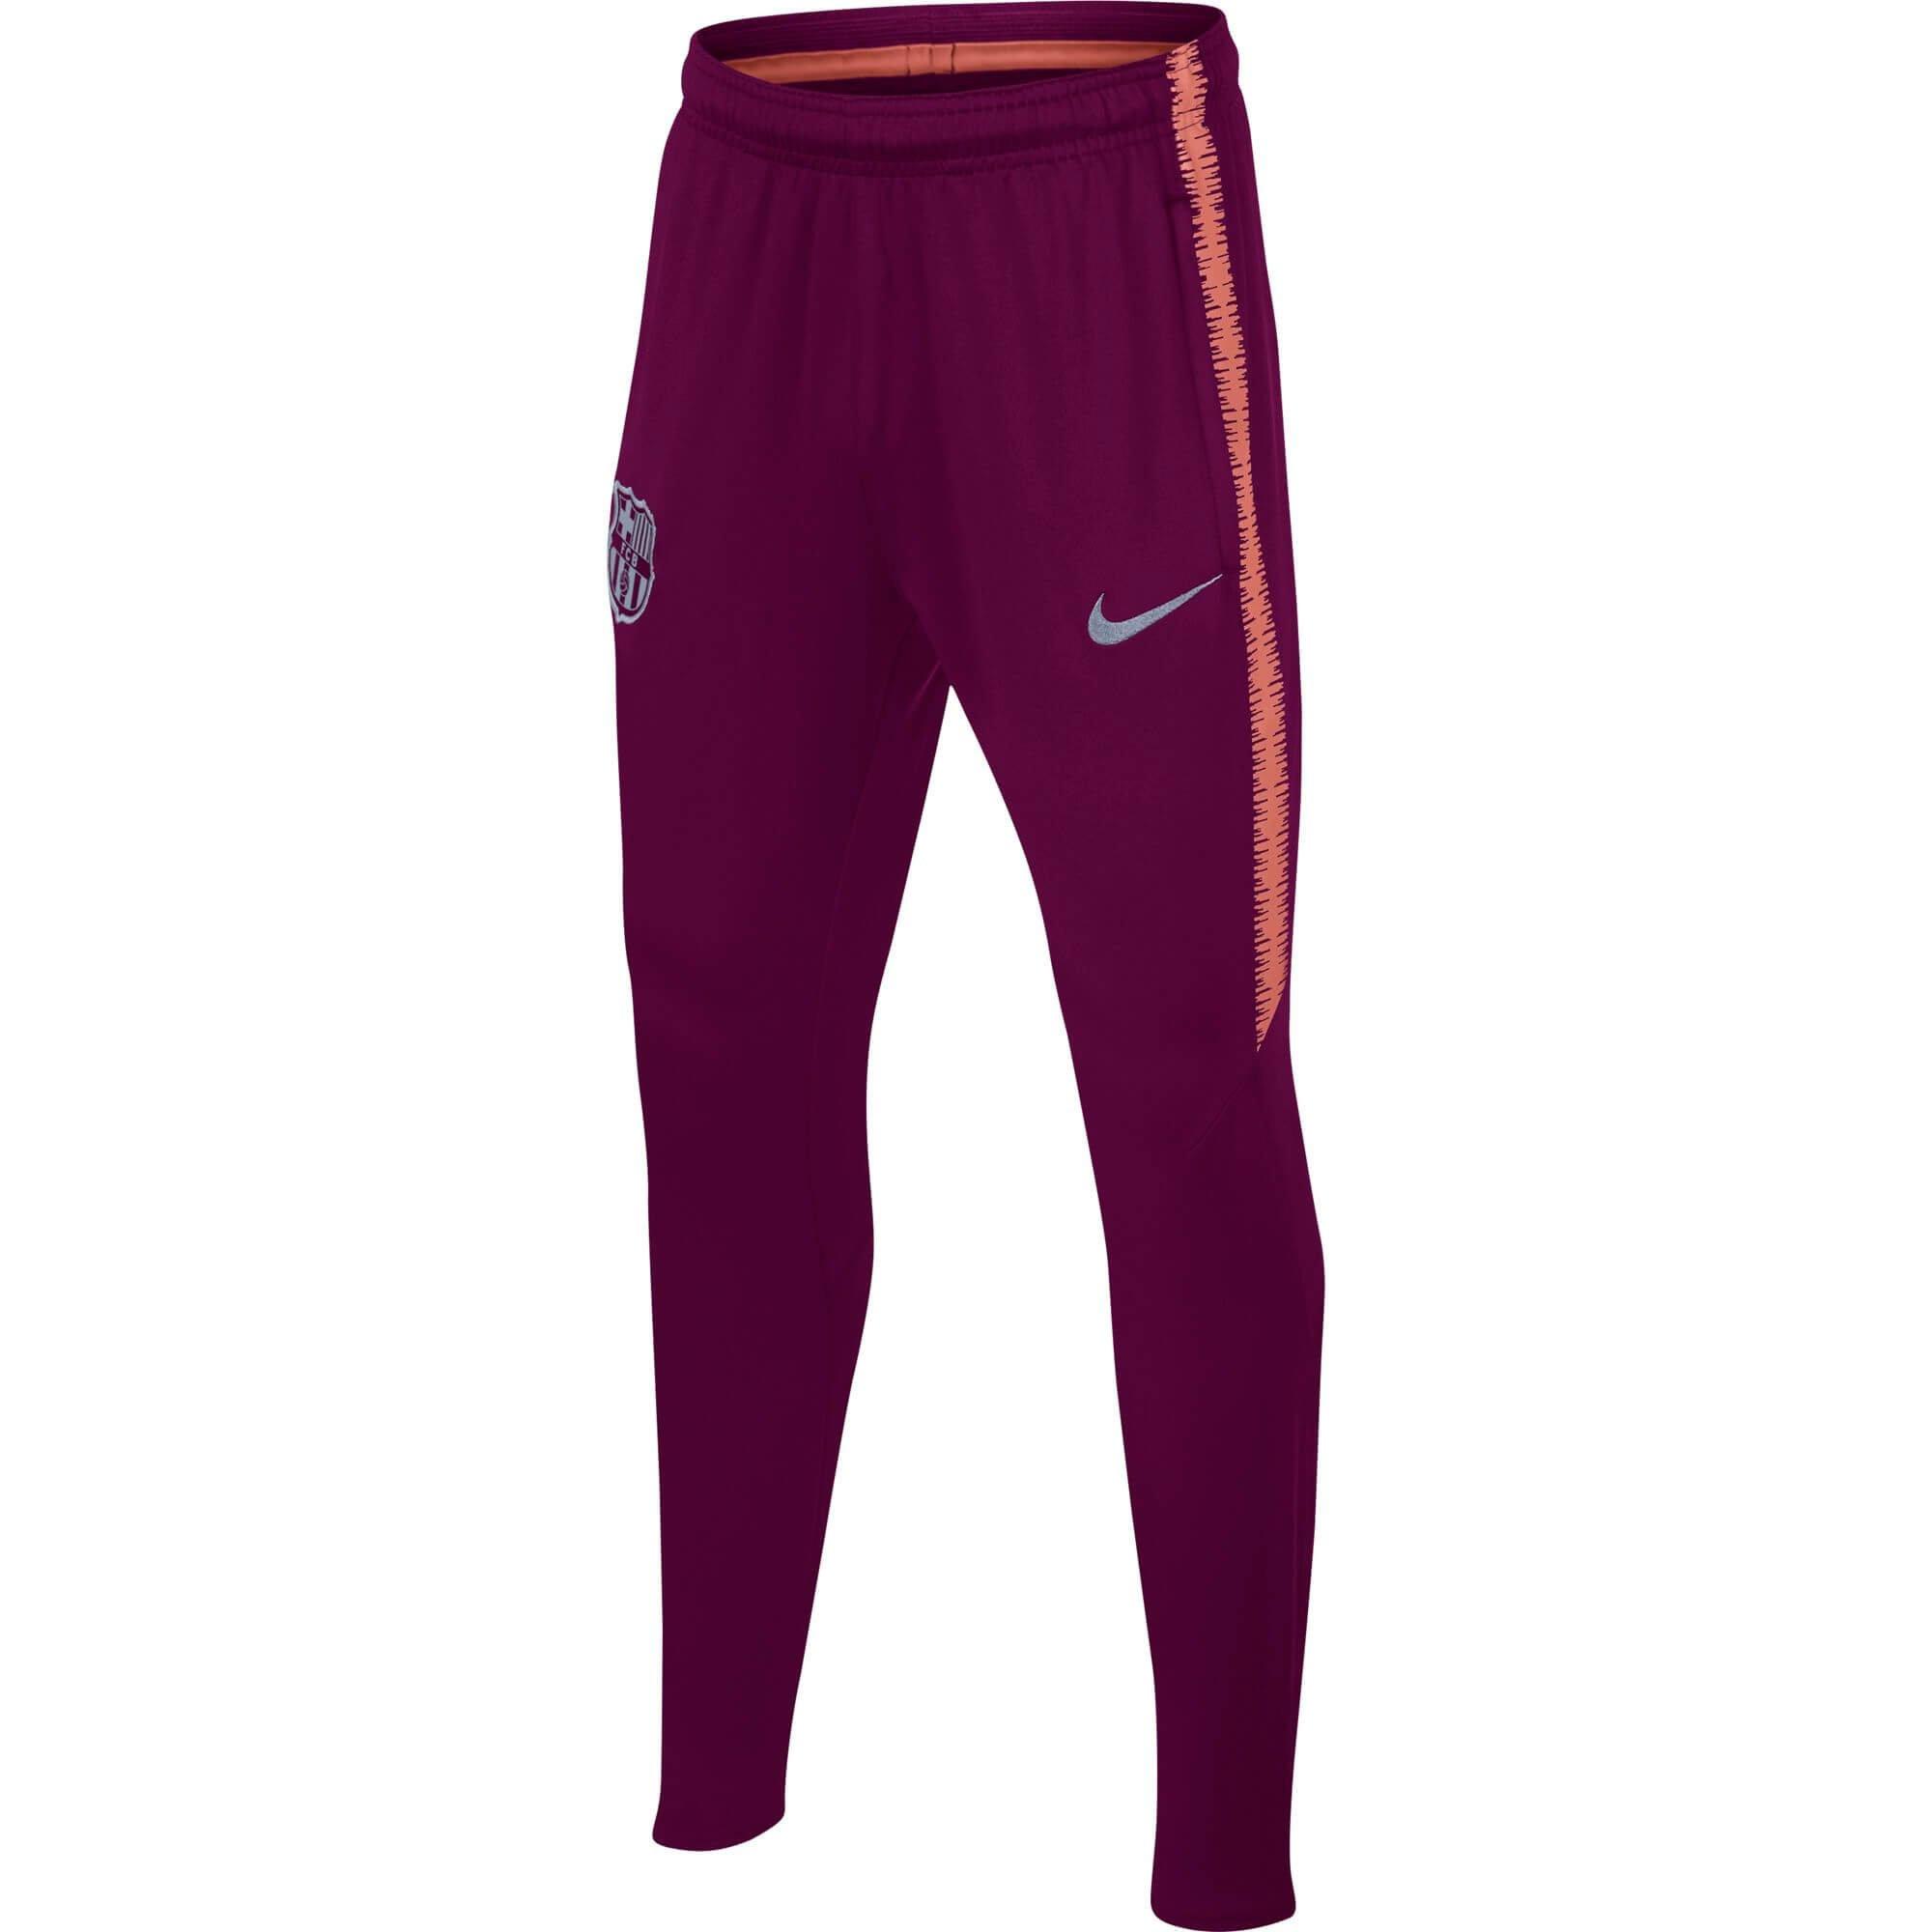 20182019 Barcelone 894409 Entrainement Junior Nike 669 Marron Pantalon SVLzGqjUpM